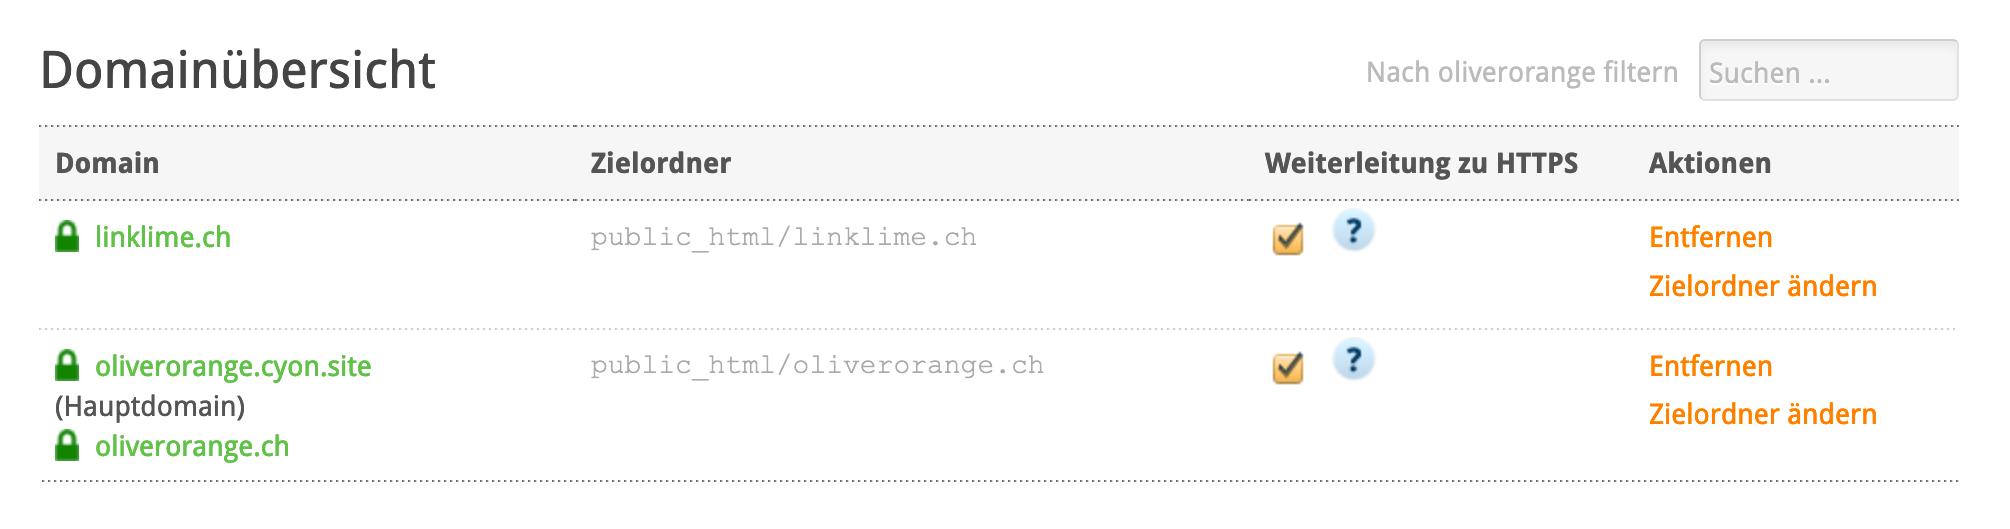 Domainübersicht im my.cyon